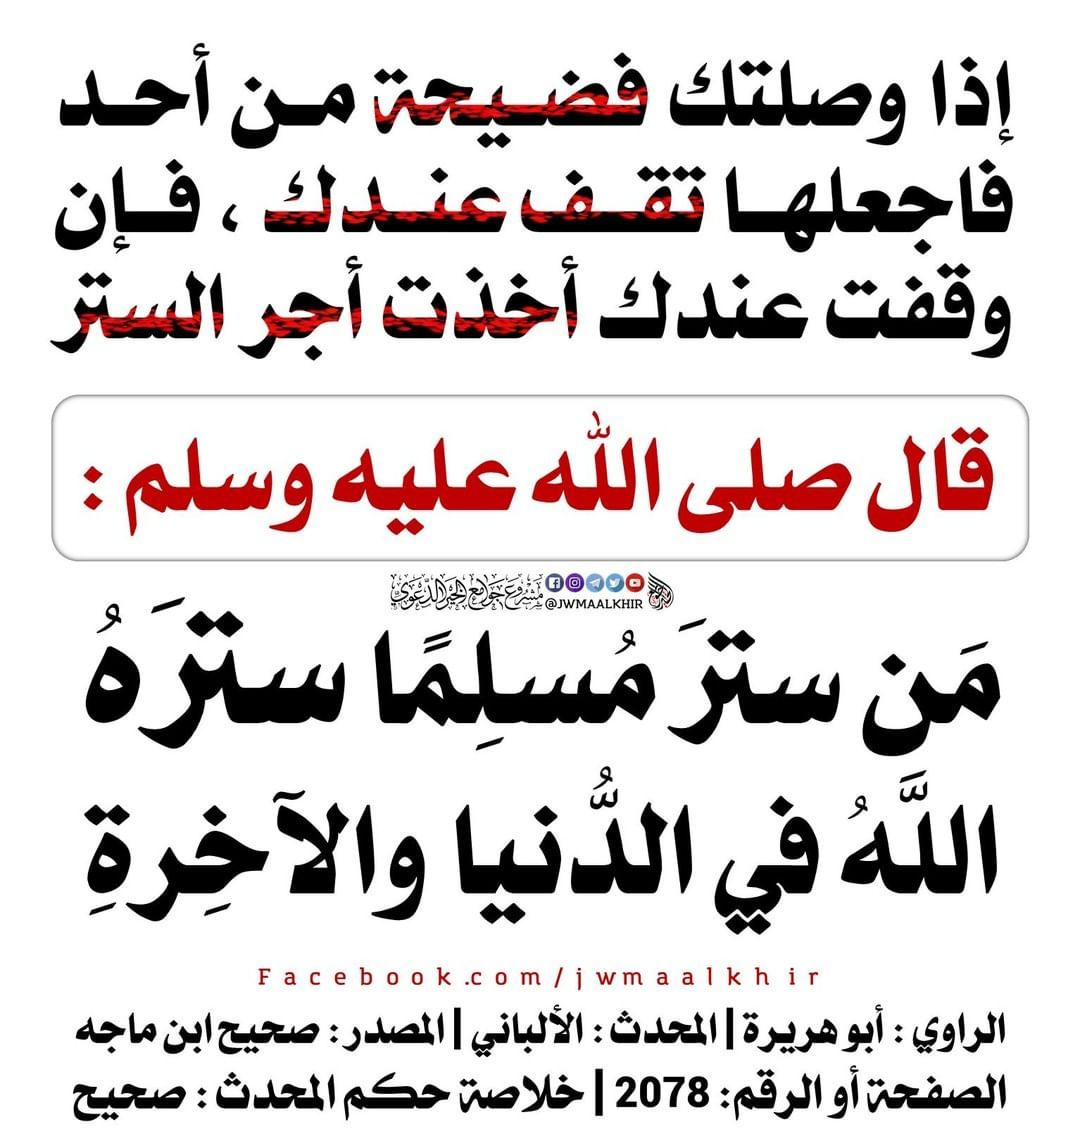 3 733 Likes 37 Comments أحاديث البخاري ومسلم Sahihan1 On Instagram الدين الإسلام قران كريم التوبة In 2020 Quran Quotes Inspirational Quran Quotes Ahadith